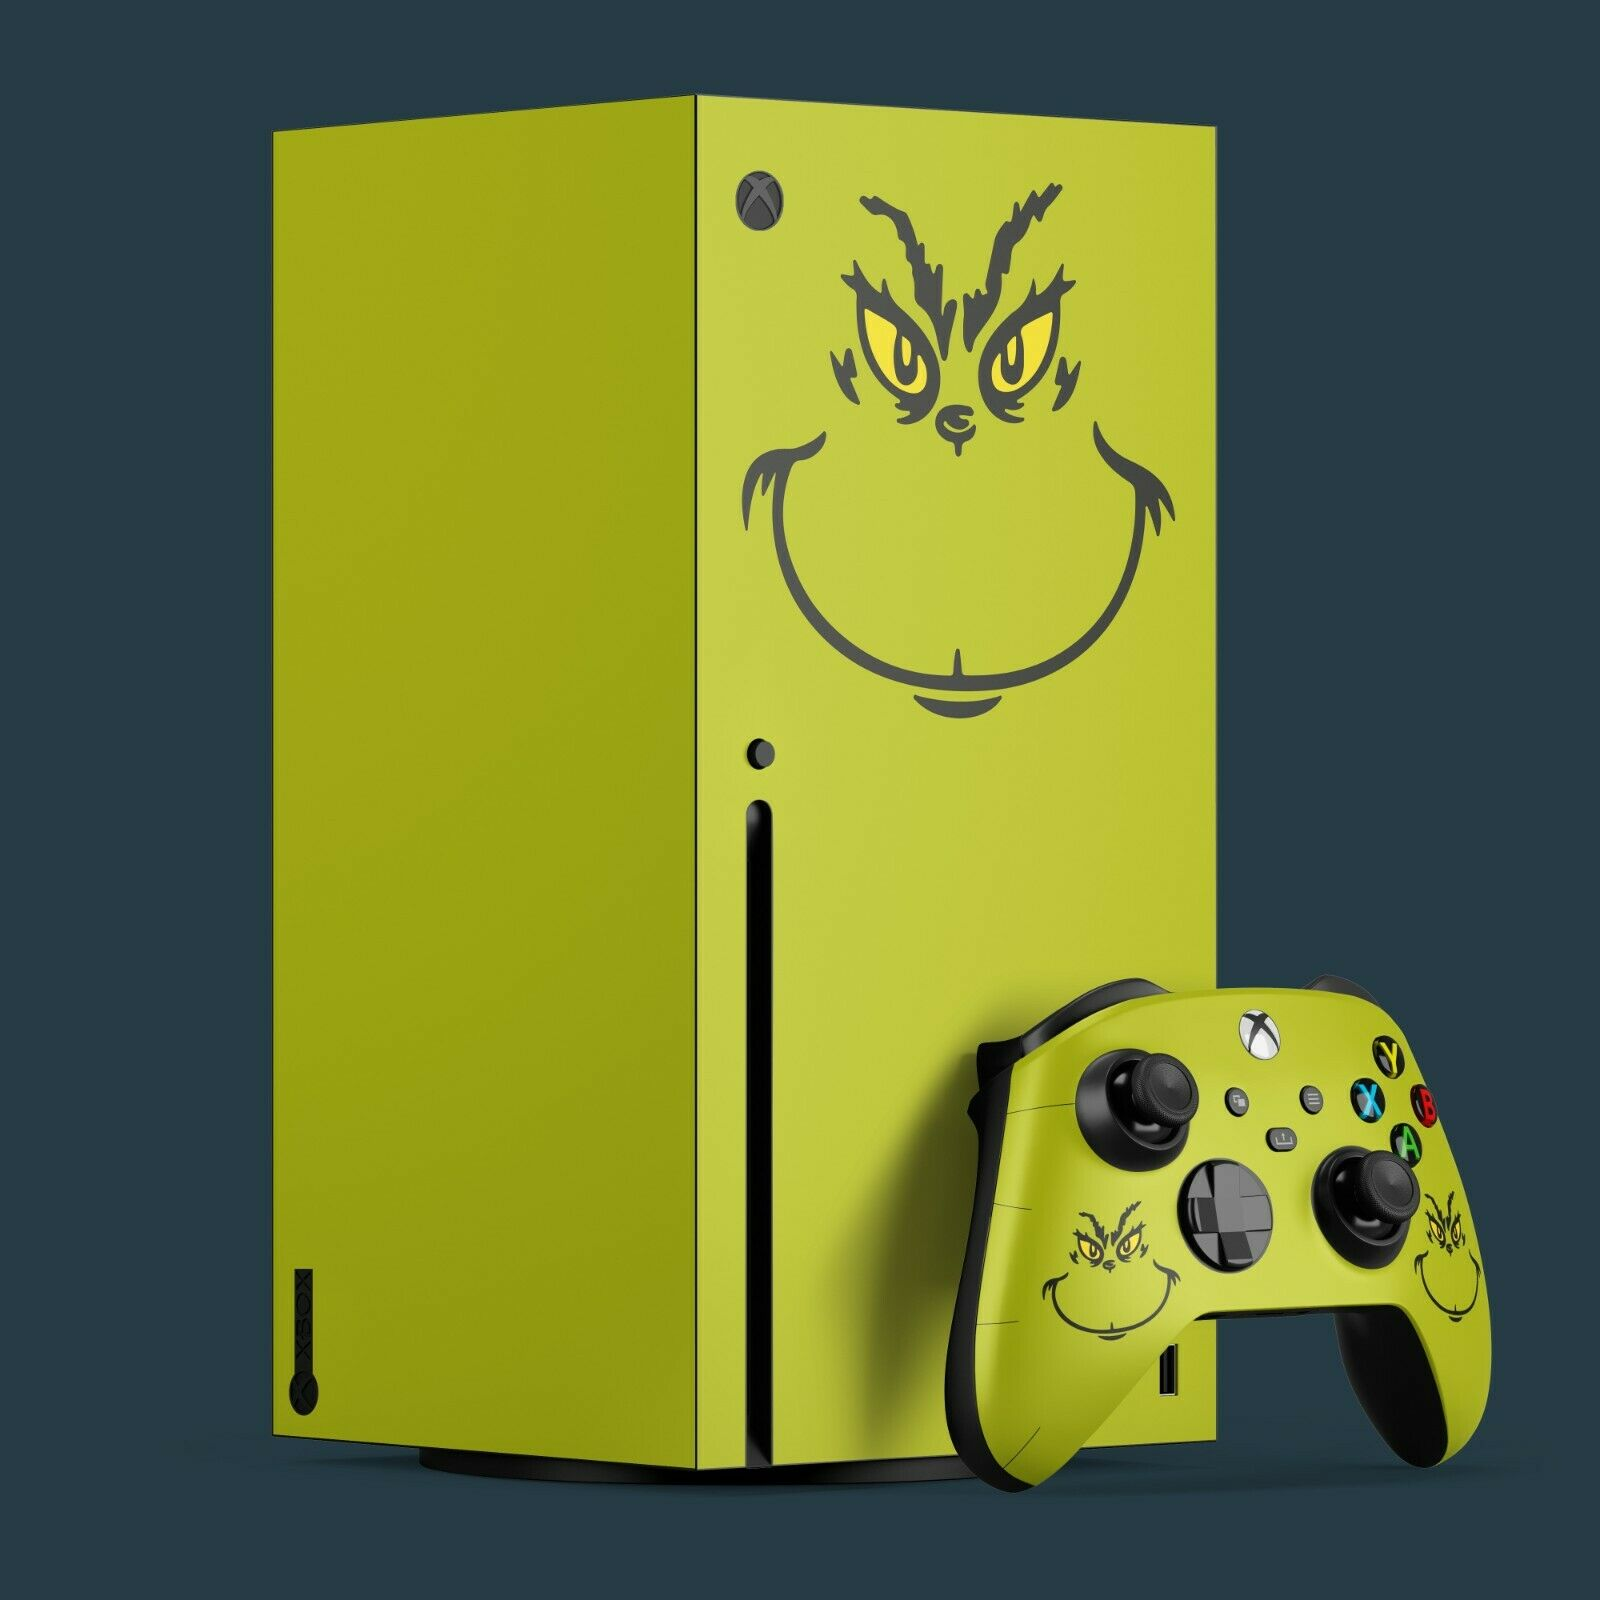 Xbox Series X Vinyl Skin & 2x Controller Vinyl Skins, The Grinch Themed.